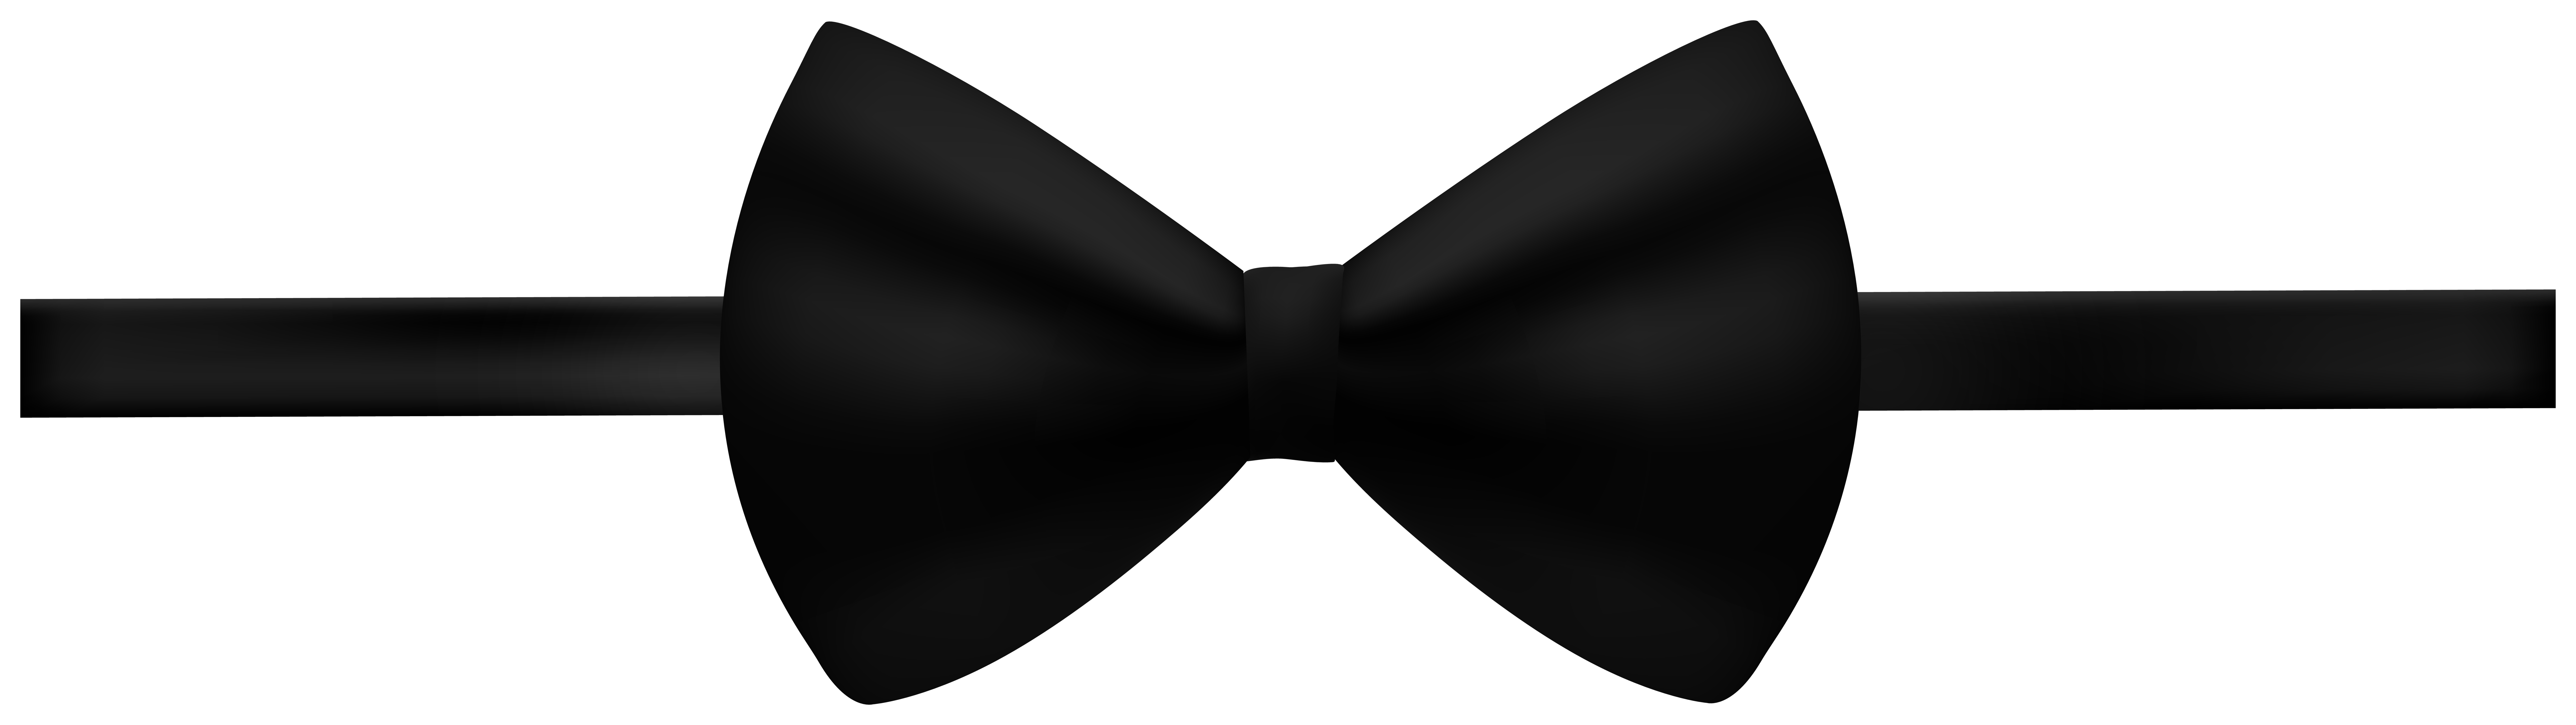 Black Bow PNG Clip Art Image.